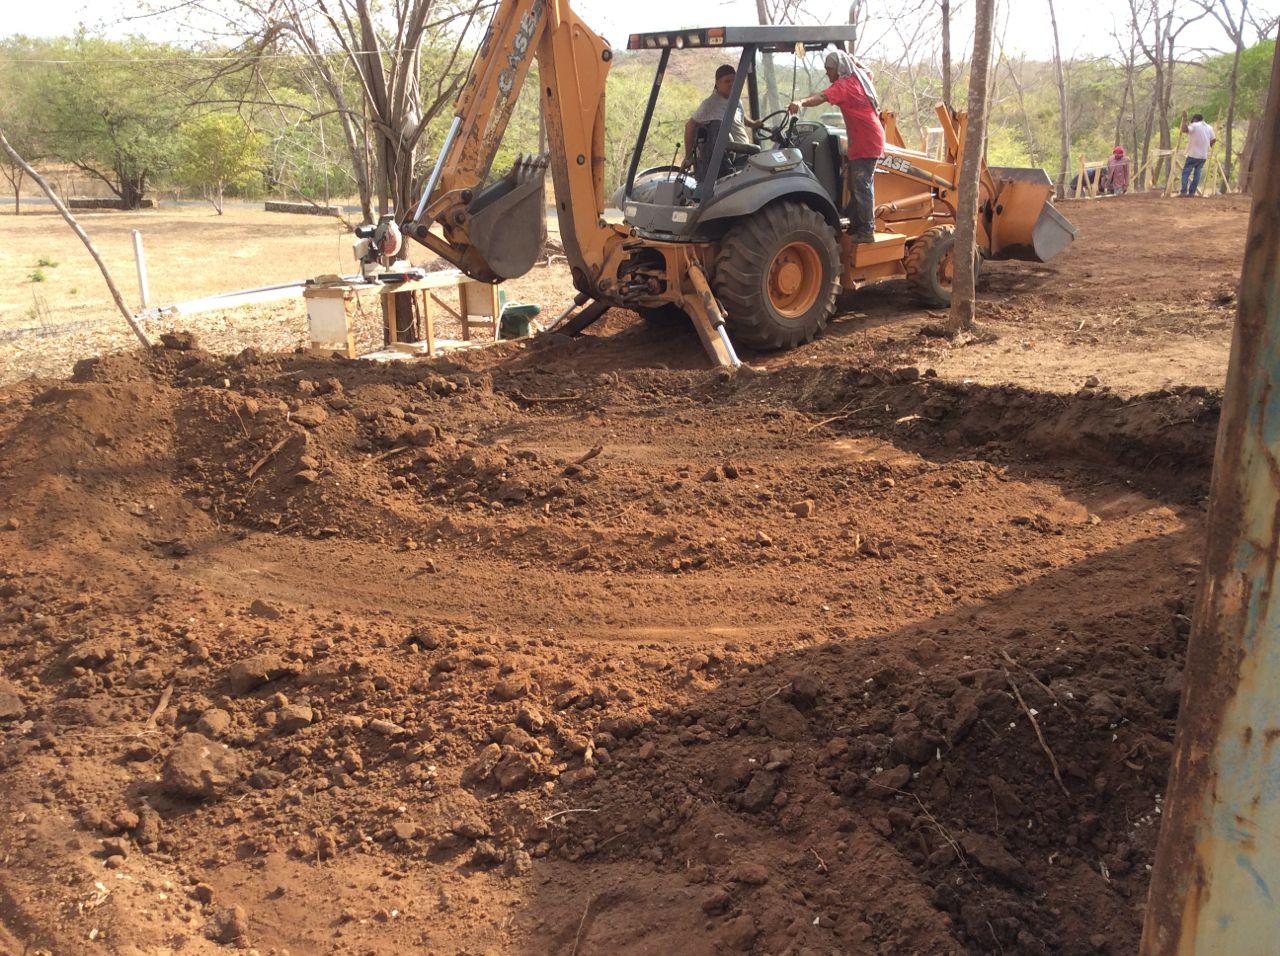 Carport excavation